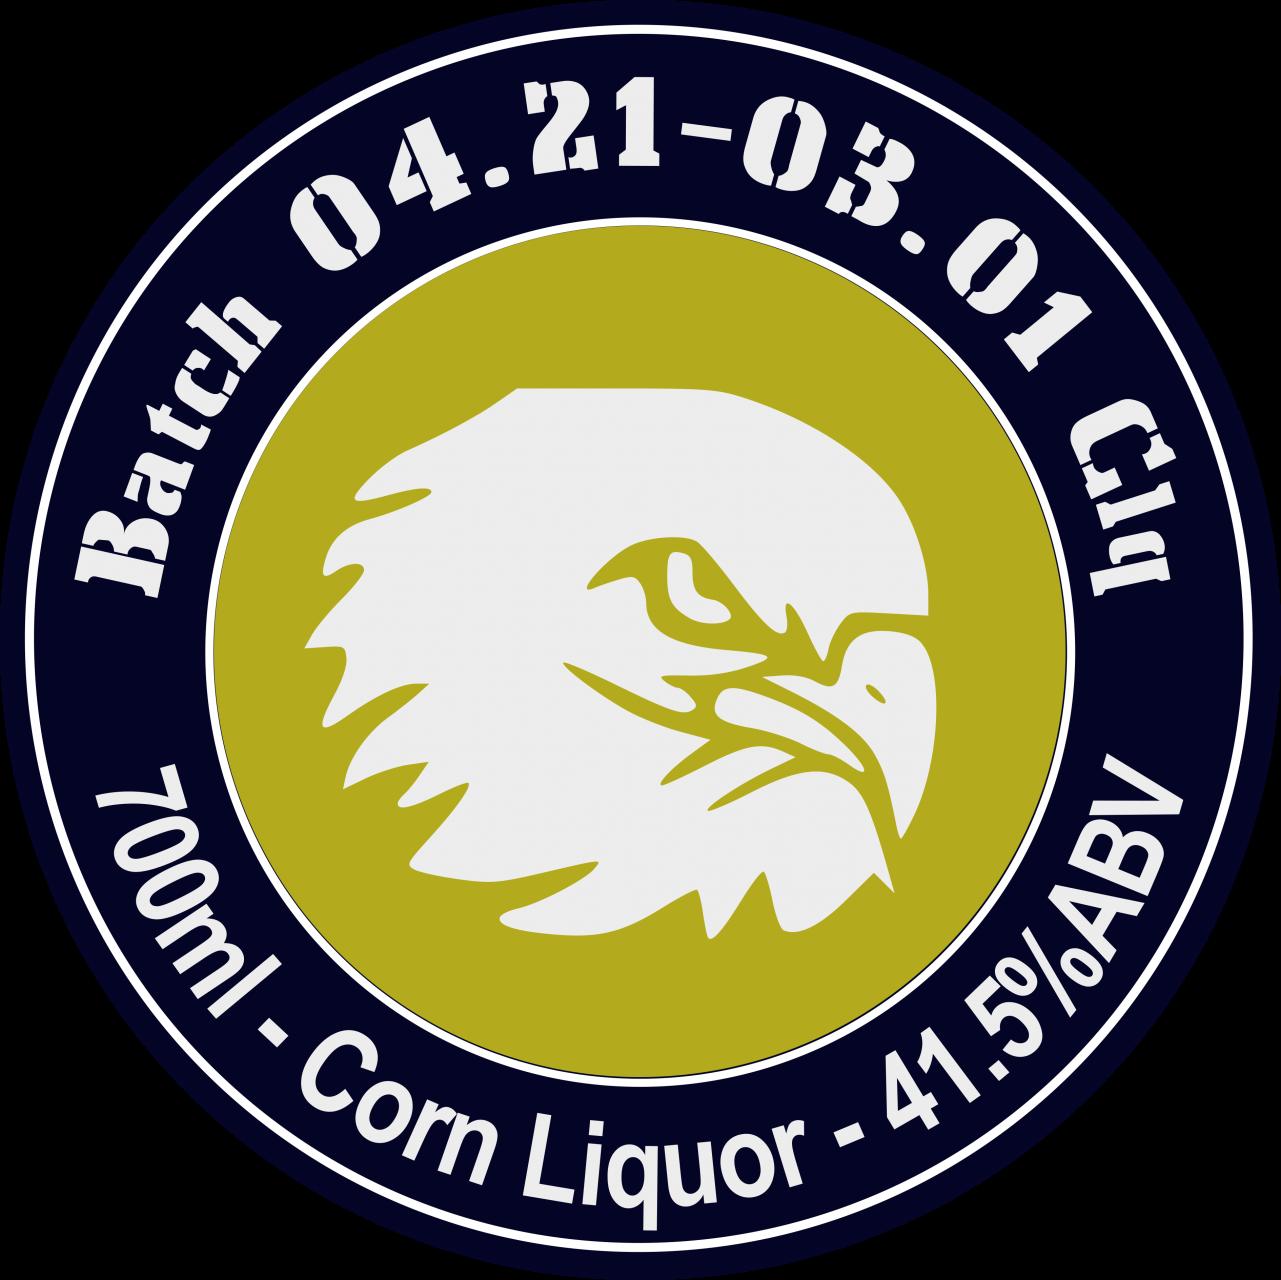 Batch 04.21 - 03.01 Clq